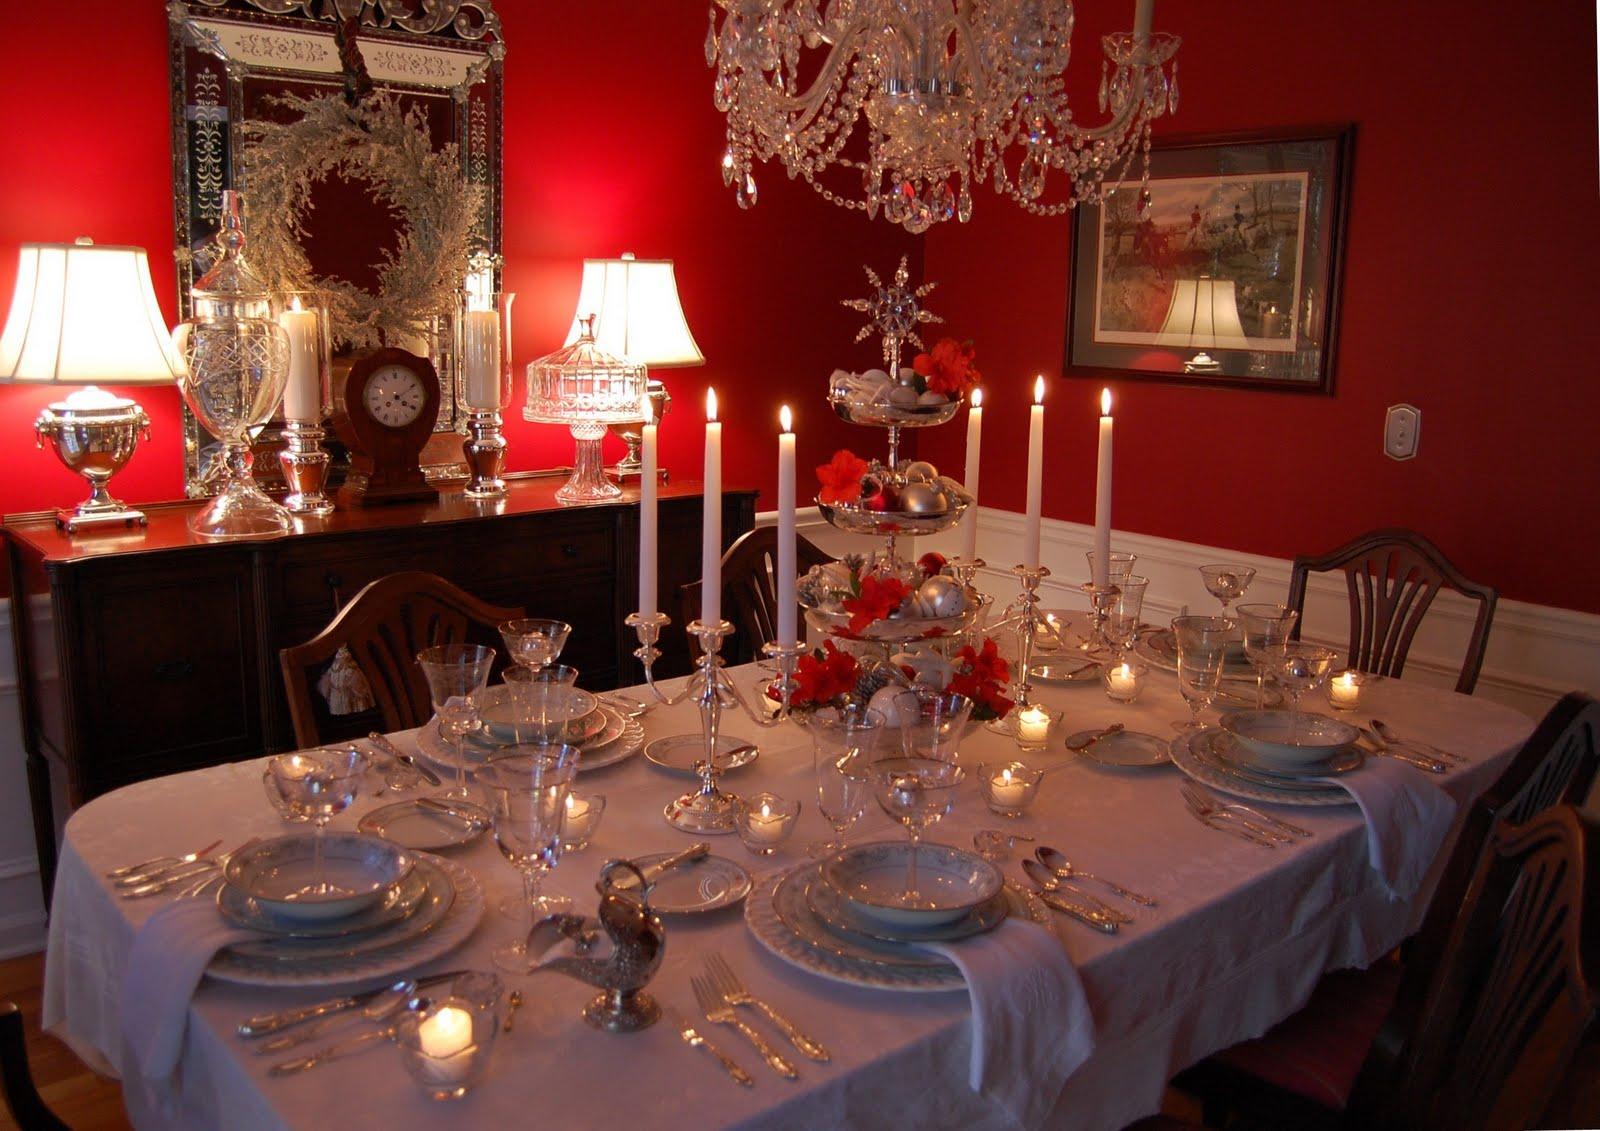 Christmas Table Decorations Ideas